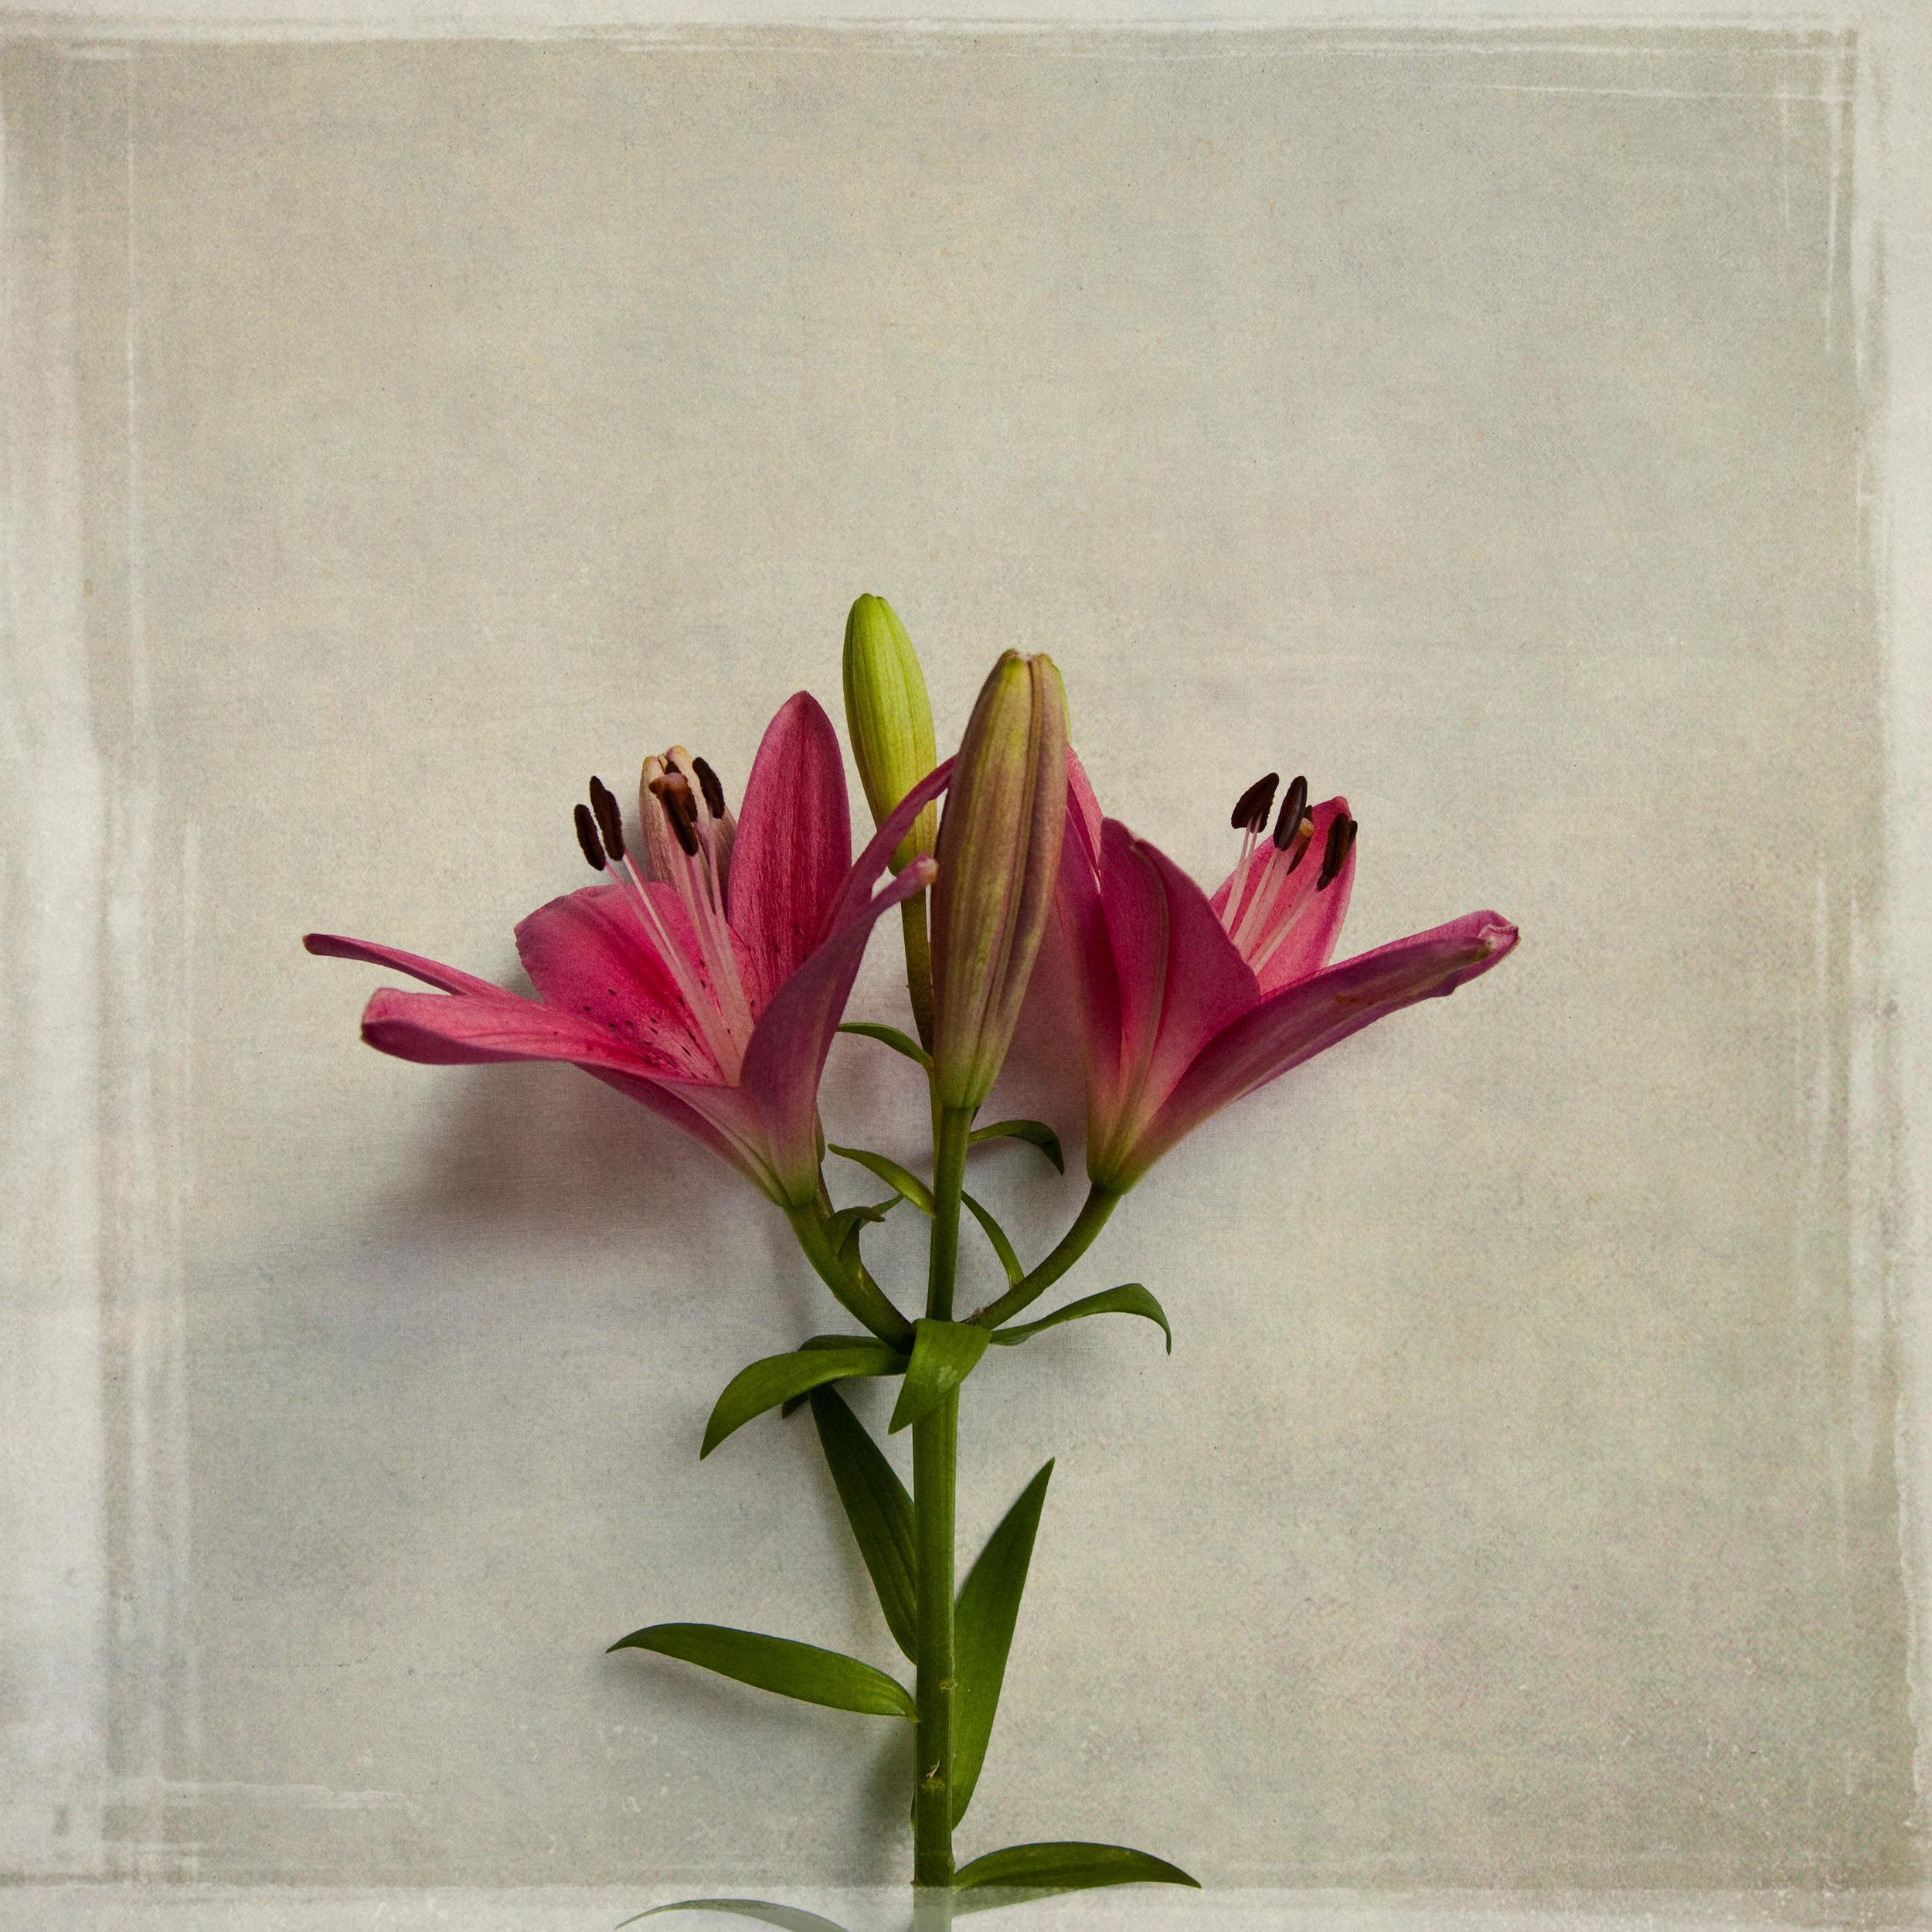 lily-7782.jpg